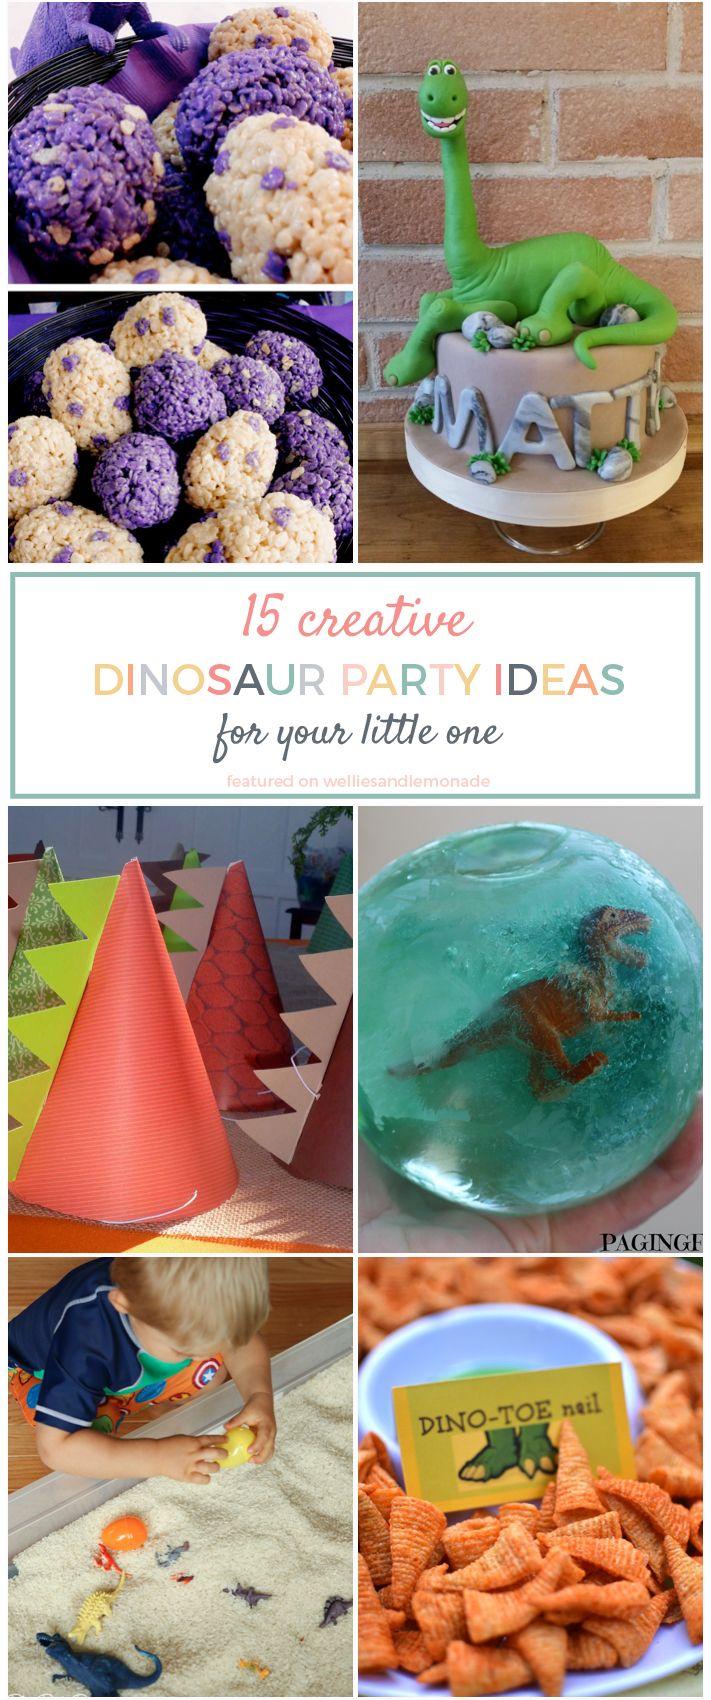 15 Creative Dinosaur Party Ideas For Your Little Onea BirthdayDinosaur Themed FoodDinosaur